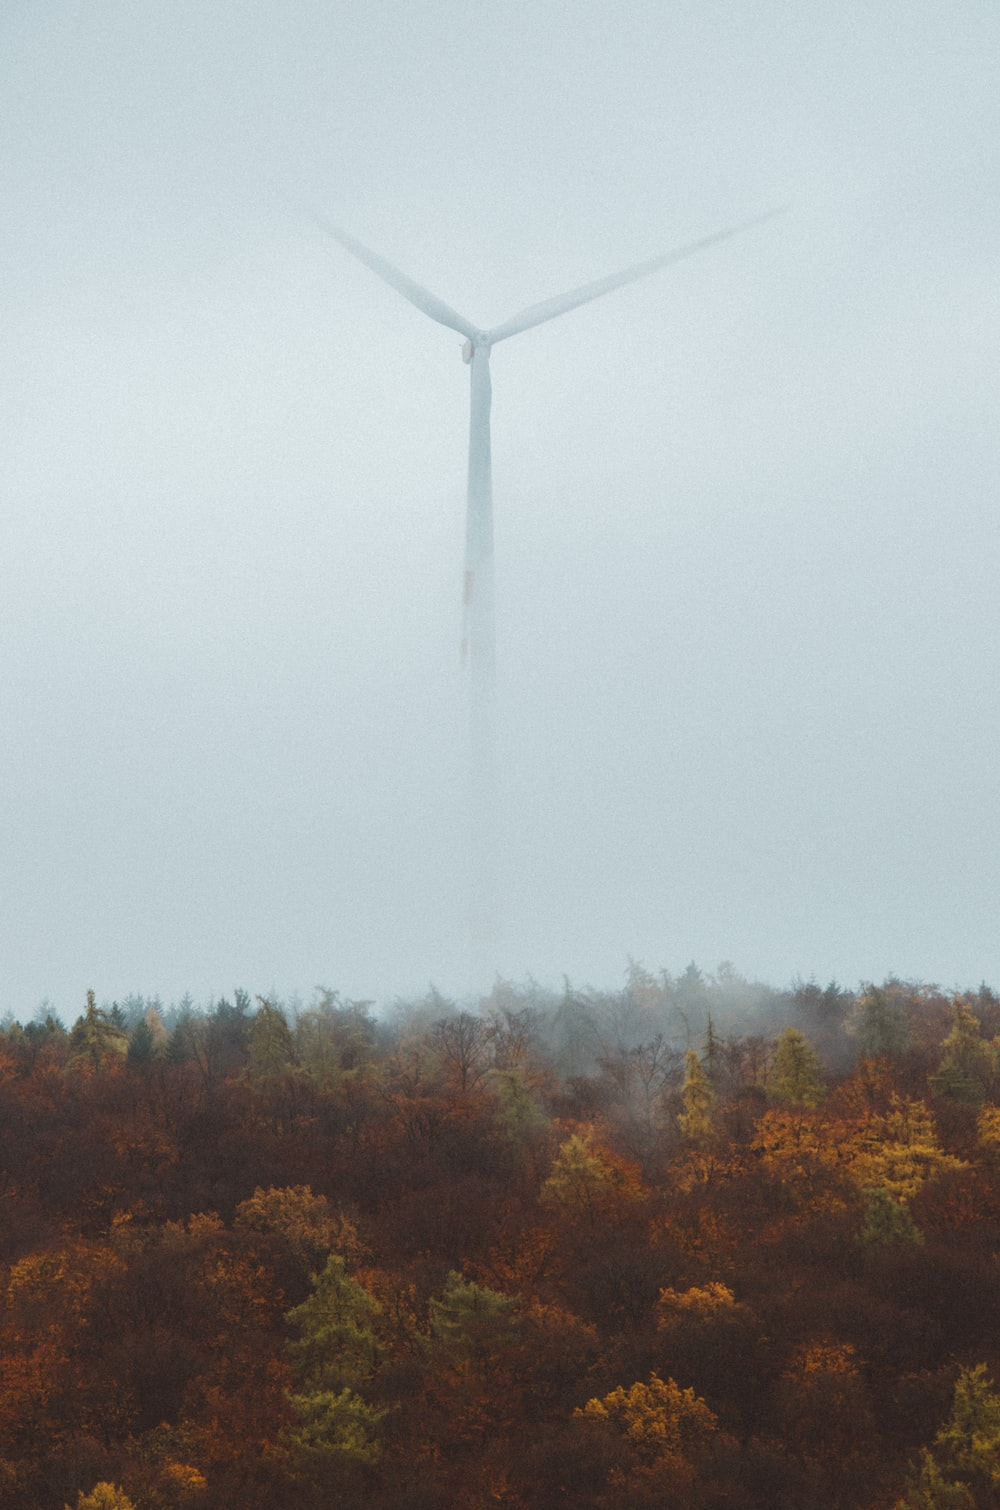 wind turbine covered in fog near forest